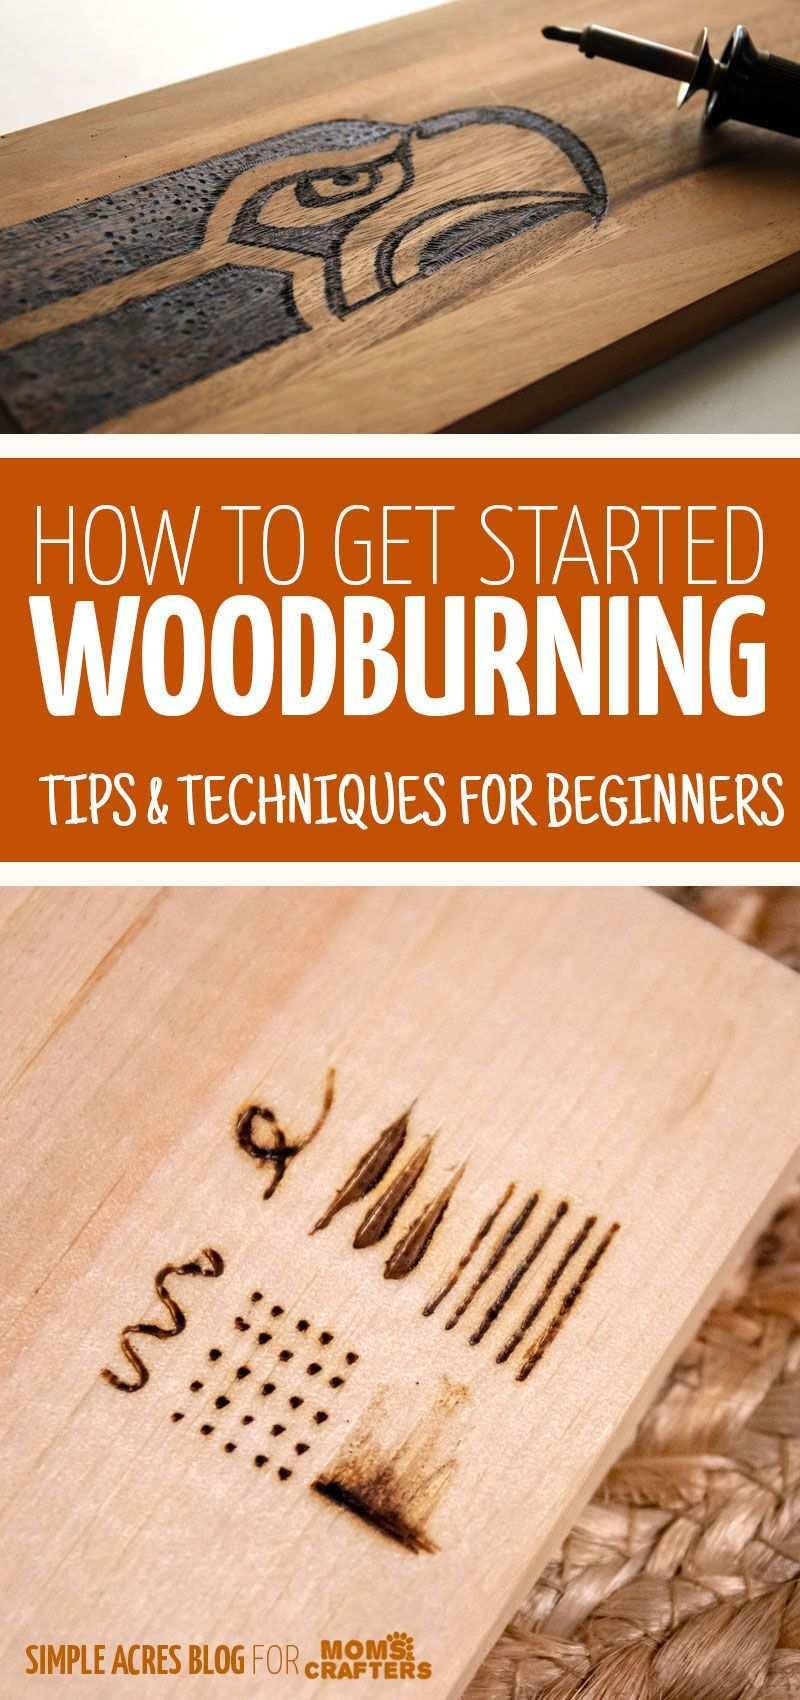 Woodburning Tips Techniques For Beginners Holzofen Handwerk Holz Gravieren Kunst Holz Gravieren Vorlagen